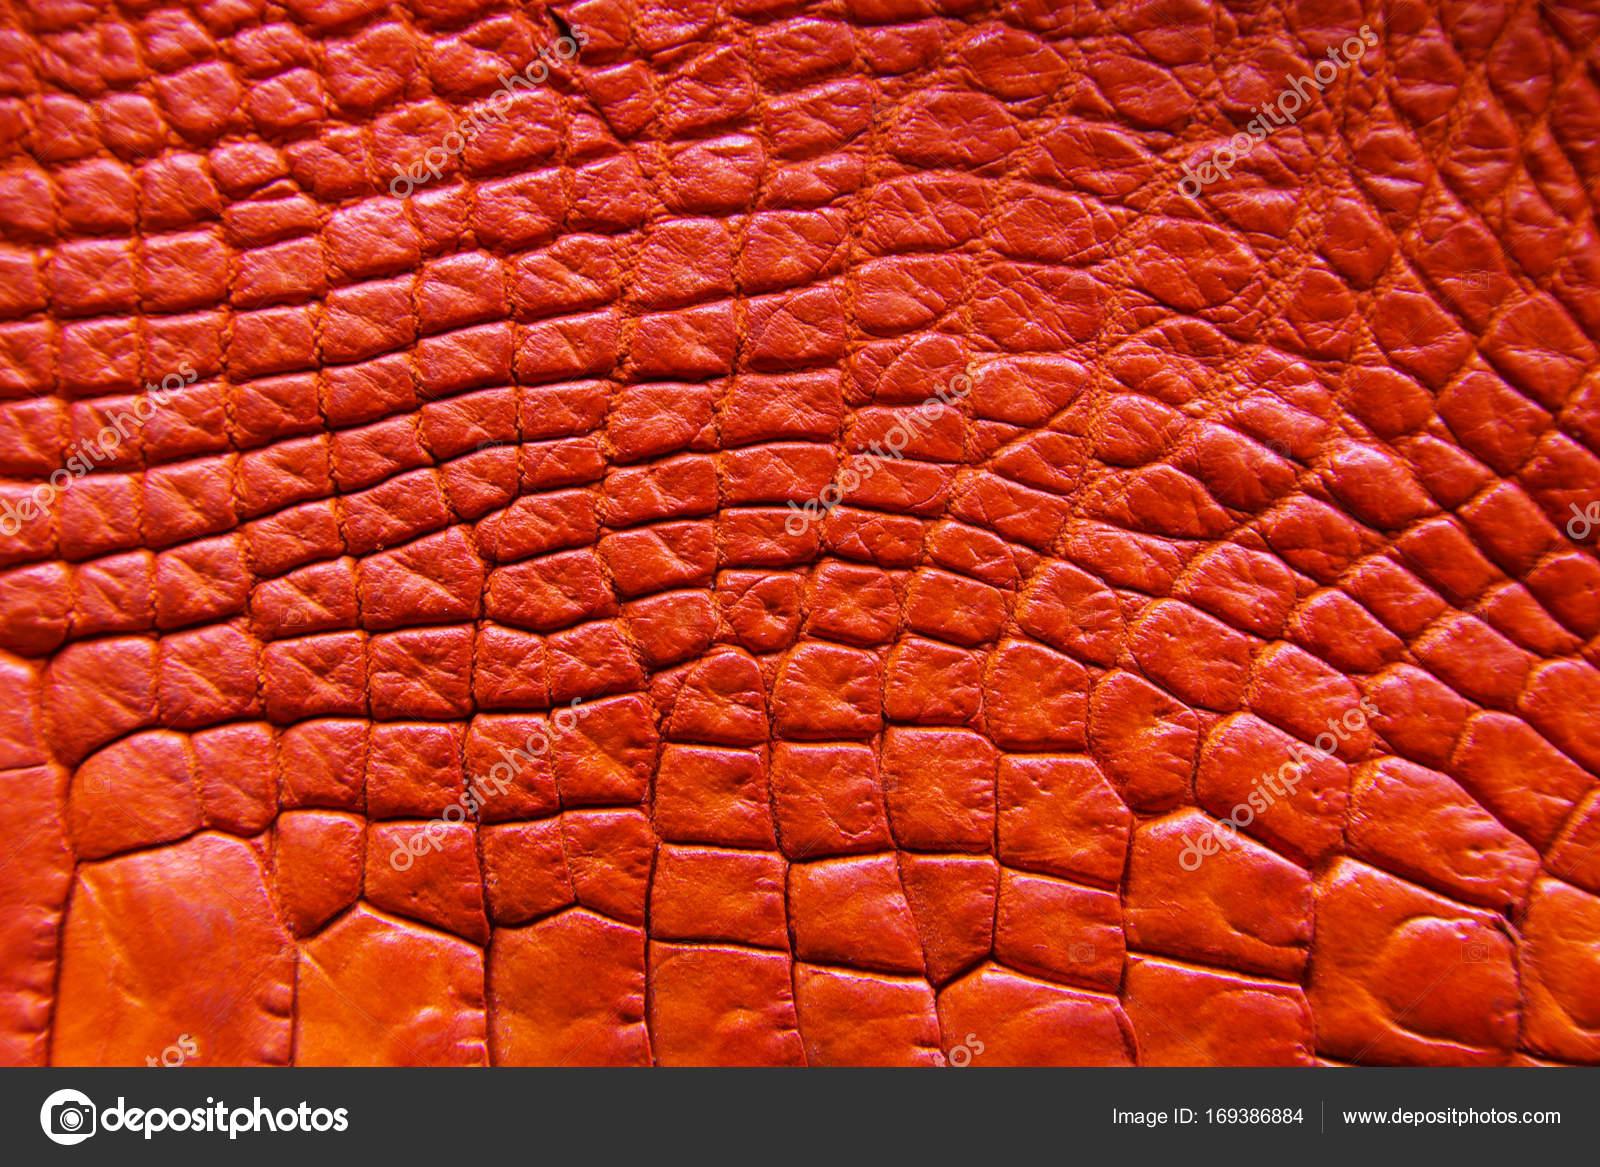 Обои Crocodile, Leather, Крокодил, фон, texture, кожа, Red, красньій. Текстуры foto 11